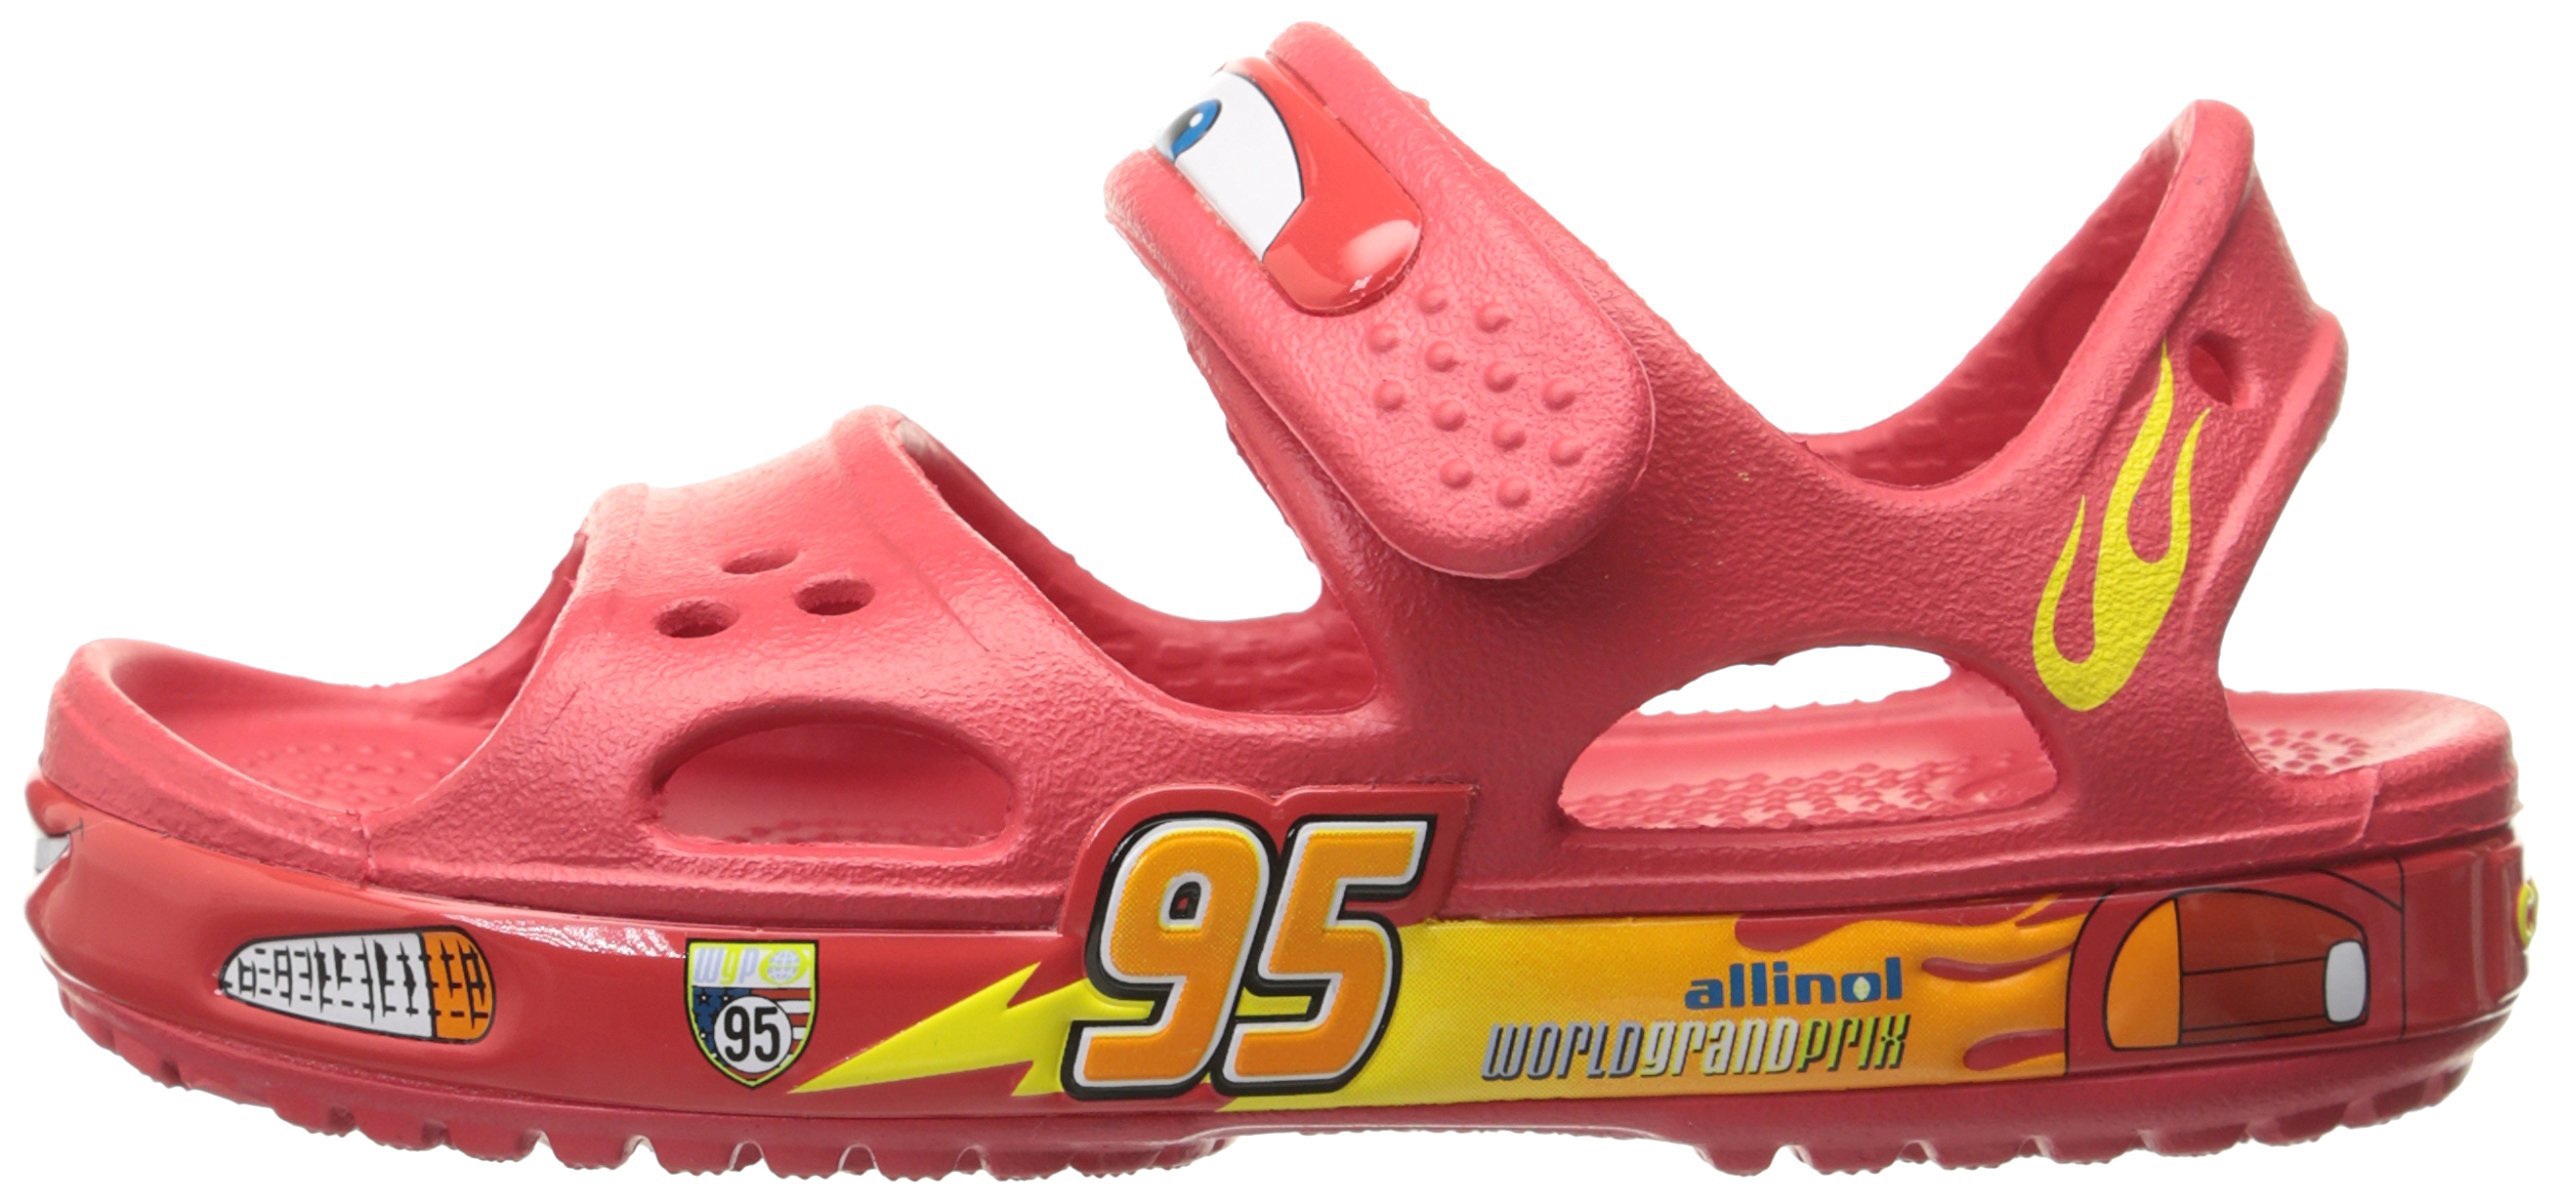 Crocs Crocband II Cars Sandal (Toddler/Little Kid), Red, 6 M US Toddler by Crocs (Image #5)